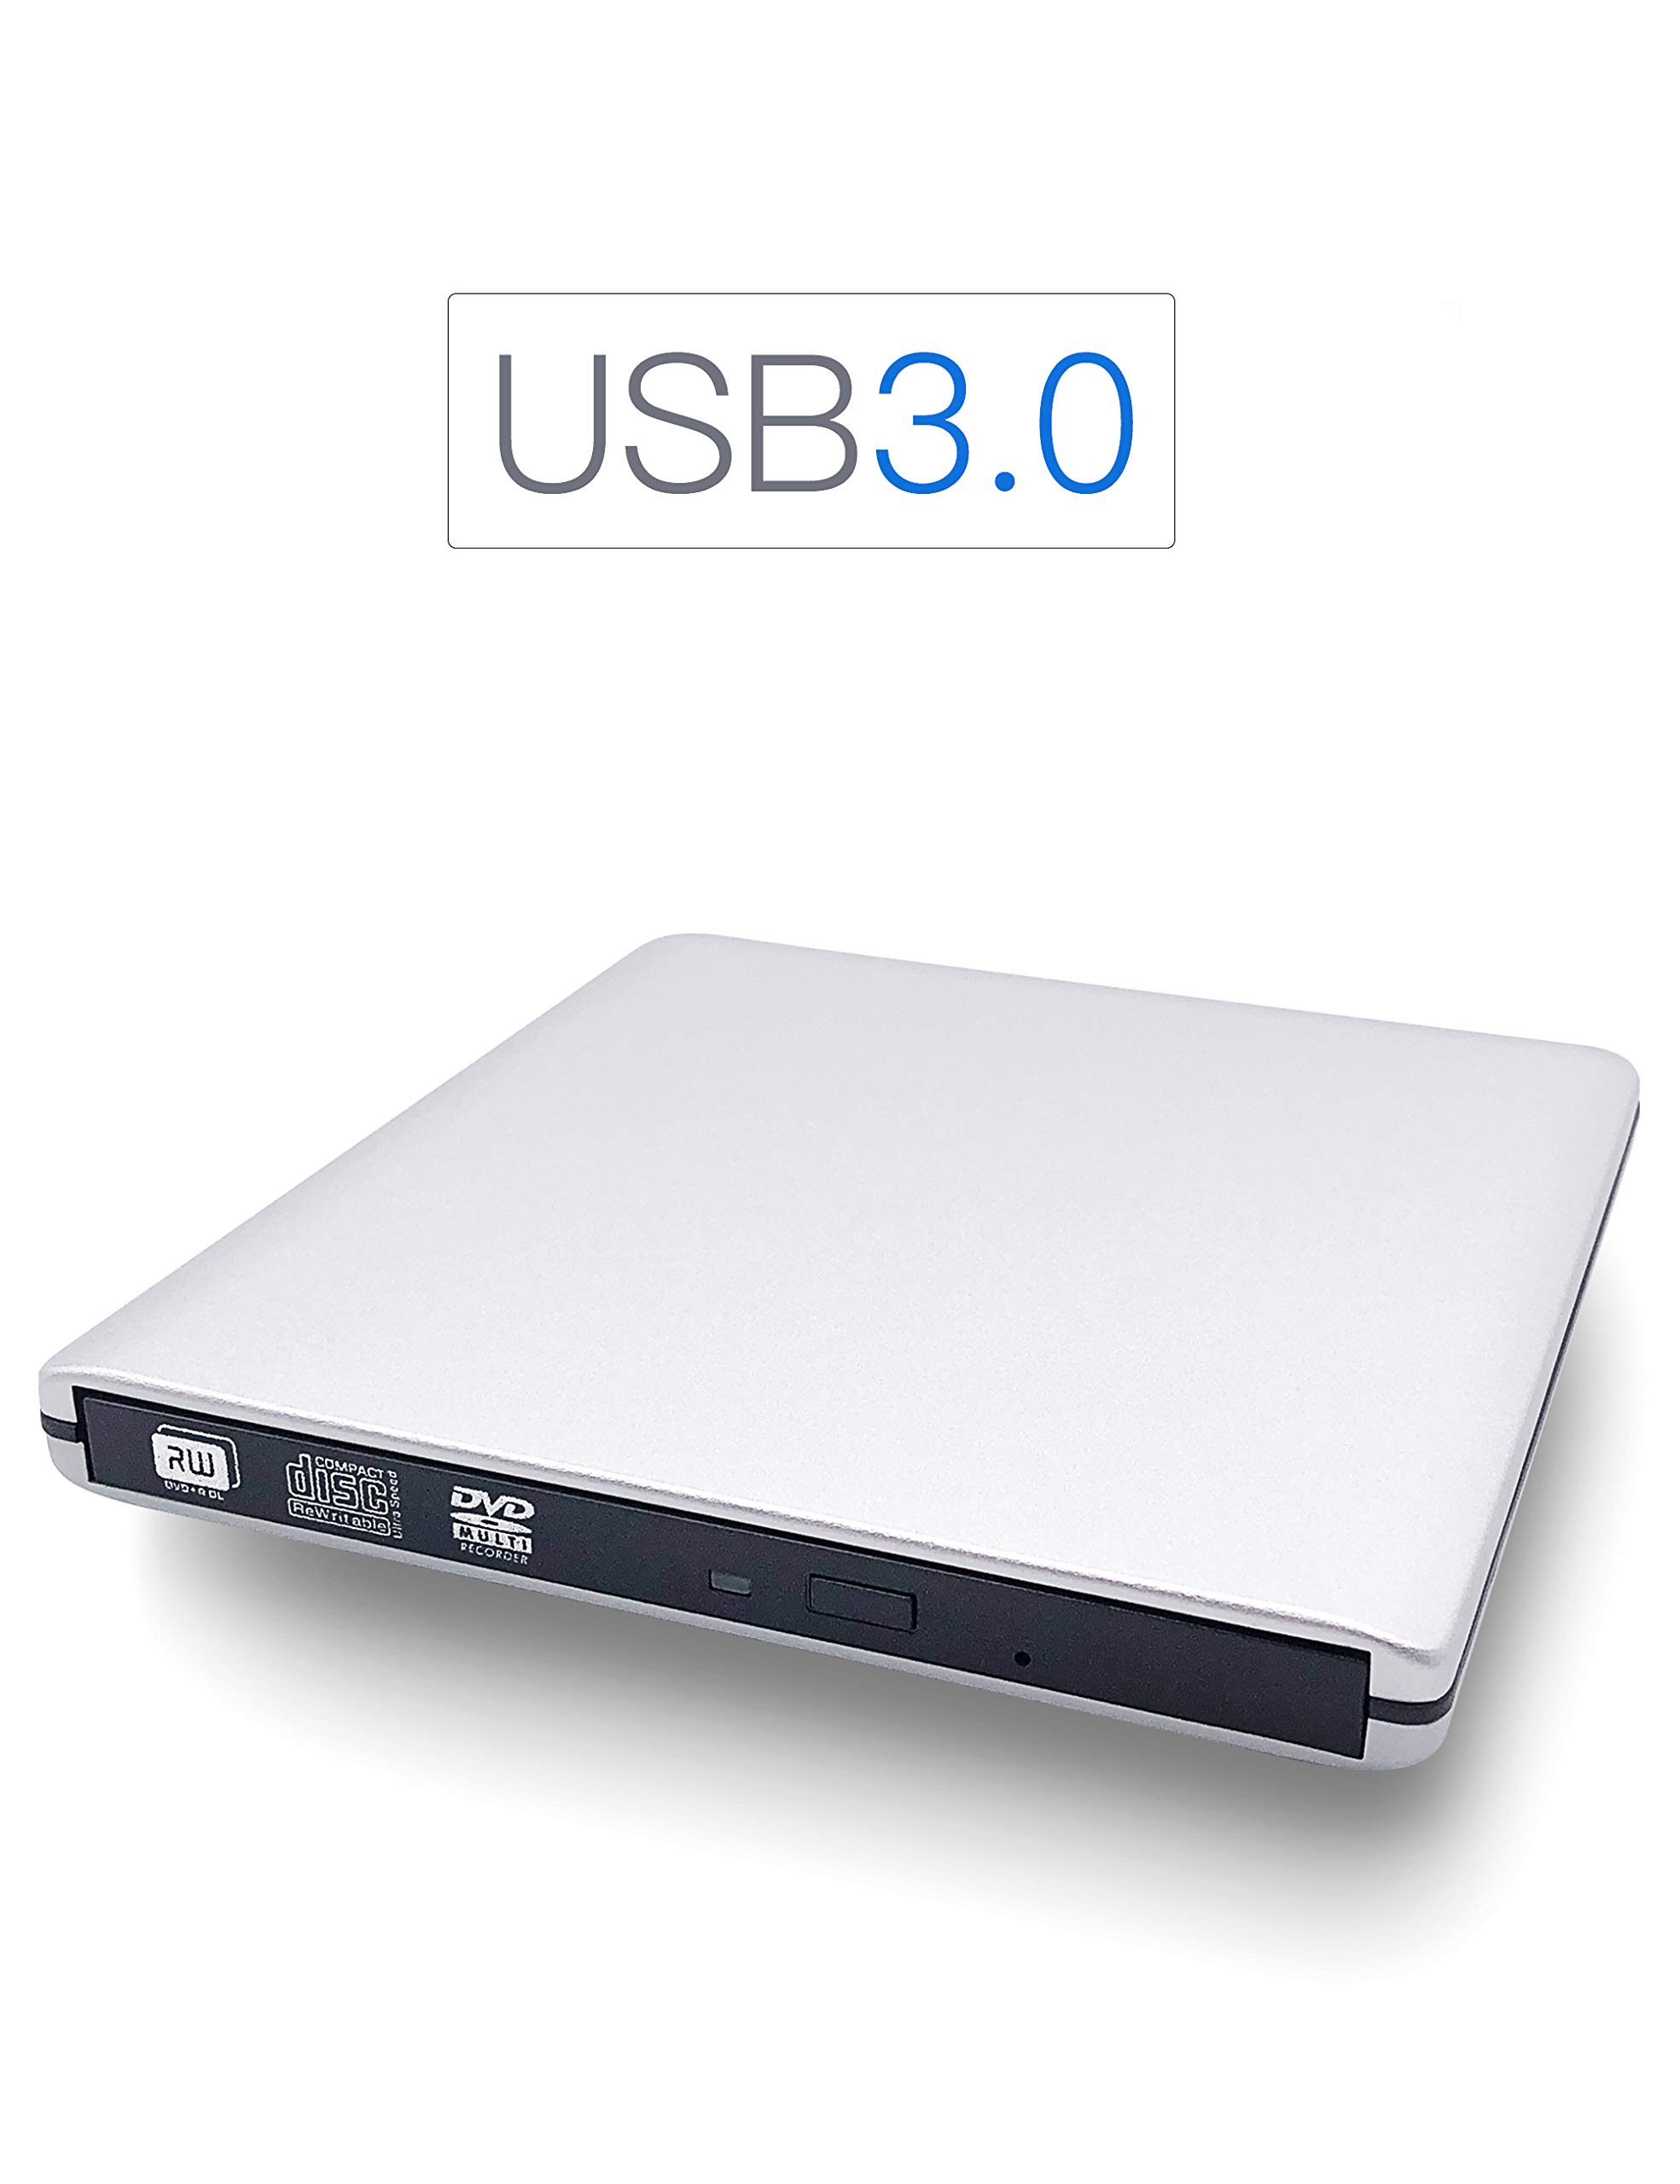 External CD DVD Drive, Haiway USB 3.0 Portable Ultra-Slim Re-Writer Burner Super-Drive High Speed Data Transfer for Laptop Desktop PC Win 7/8/10 Linux OS Apple Mac (Silver)